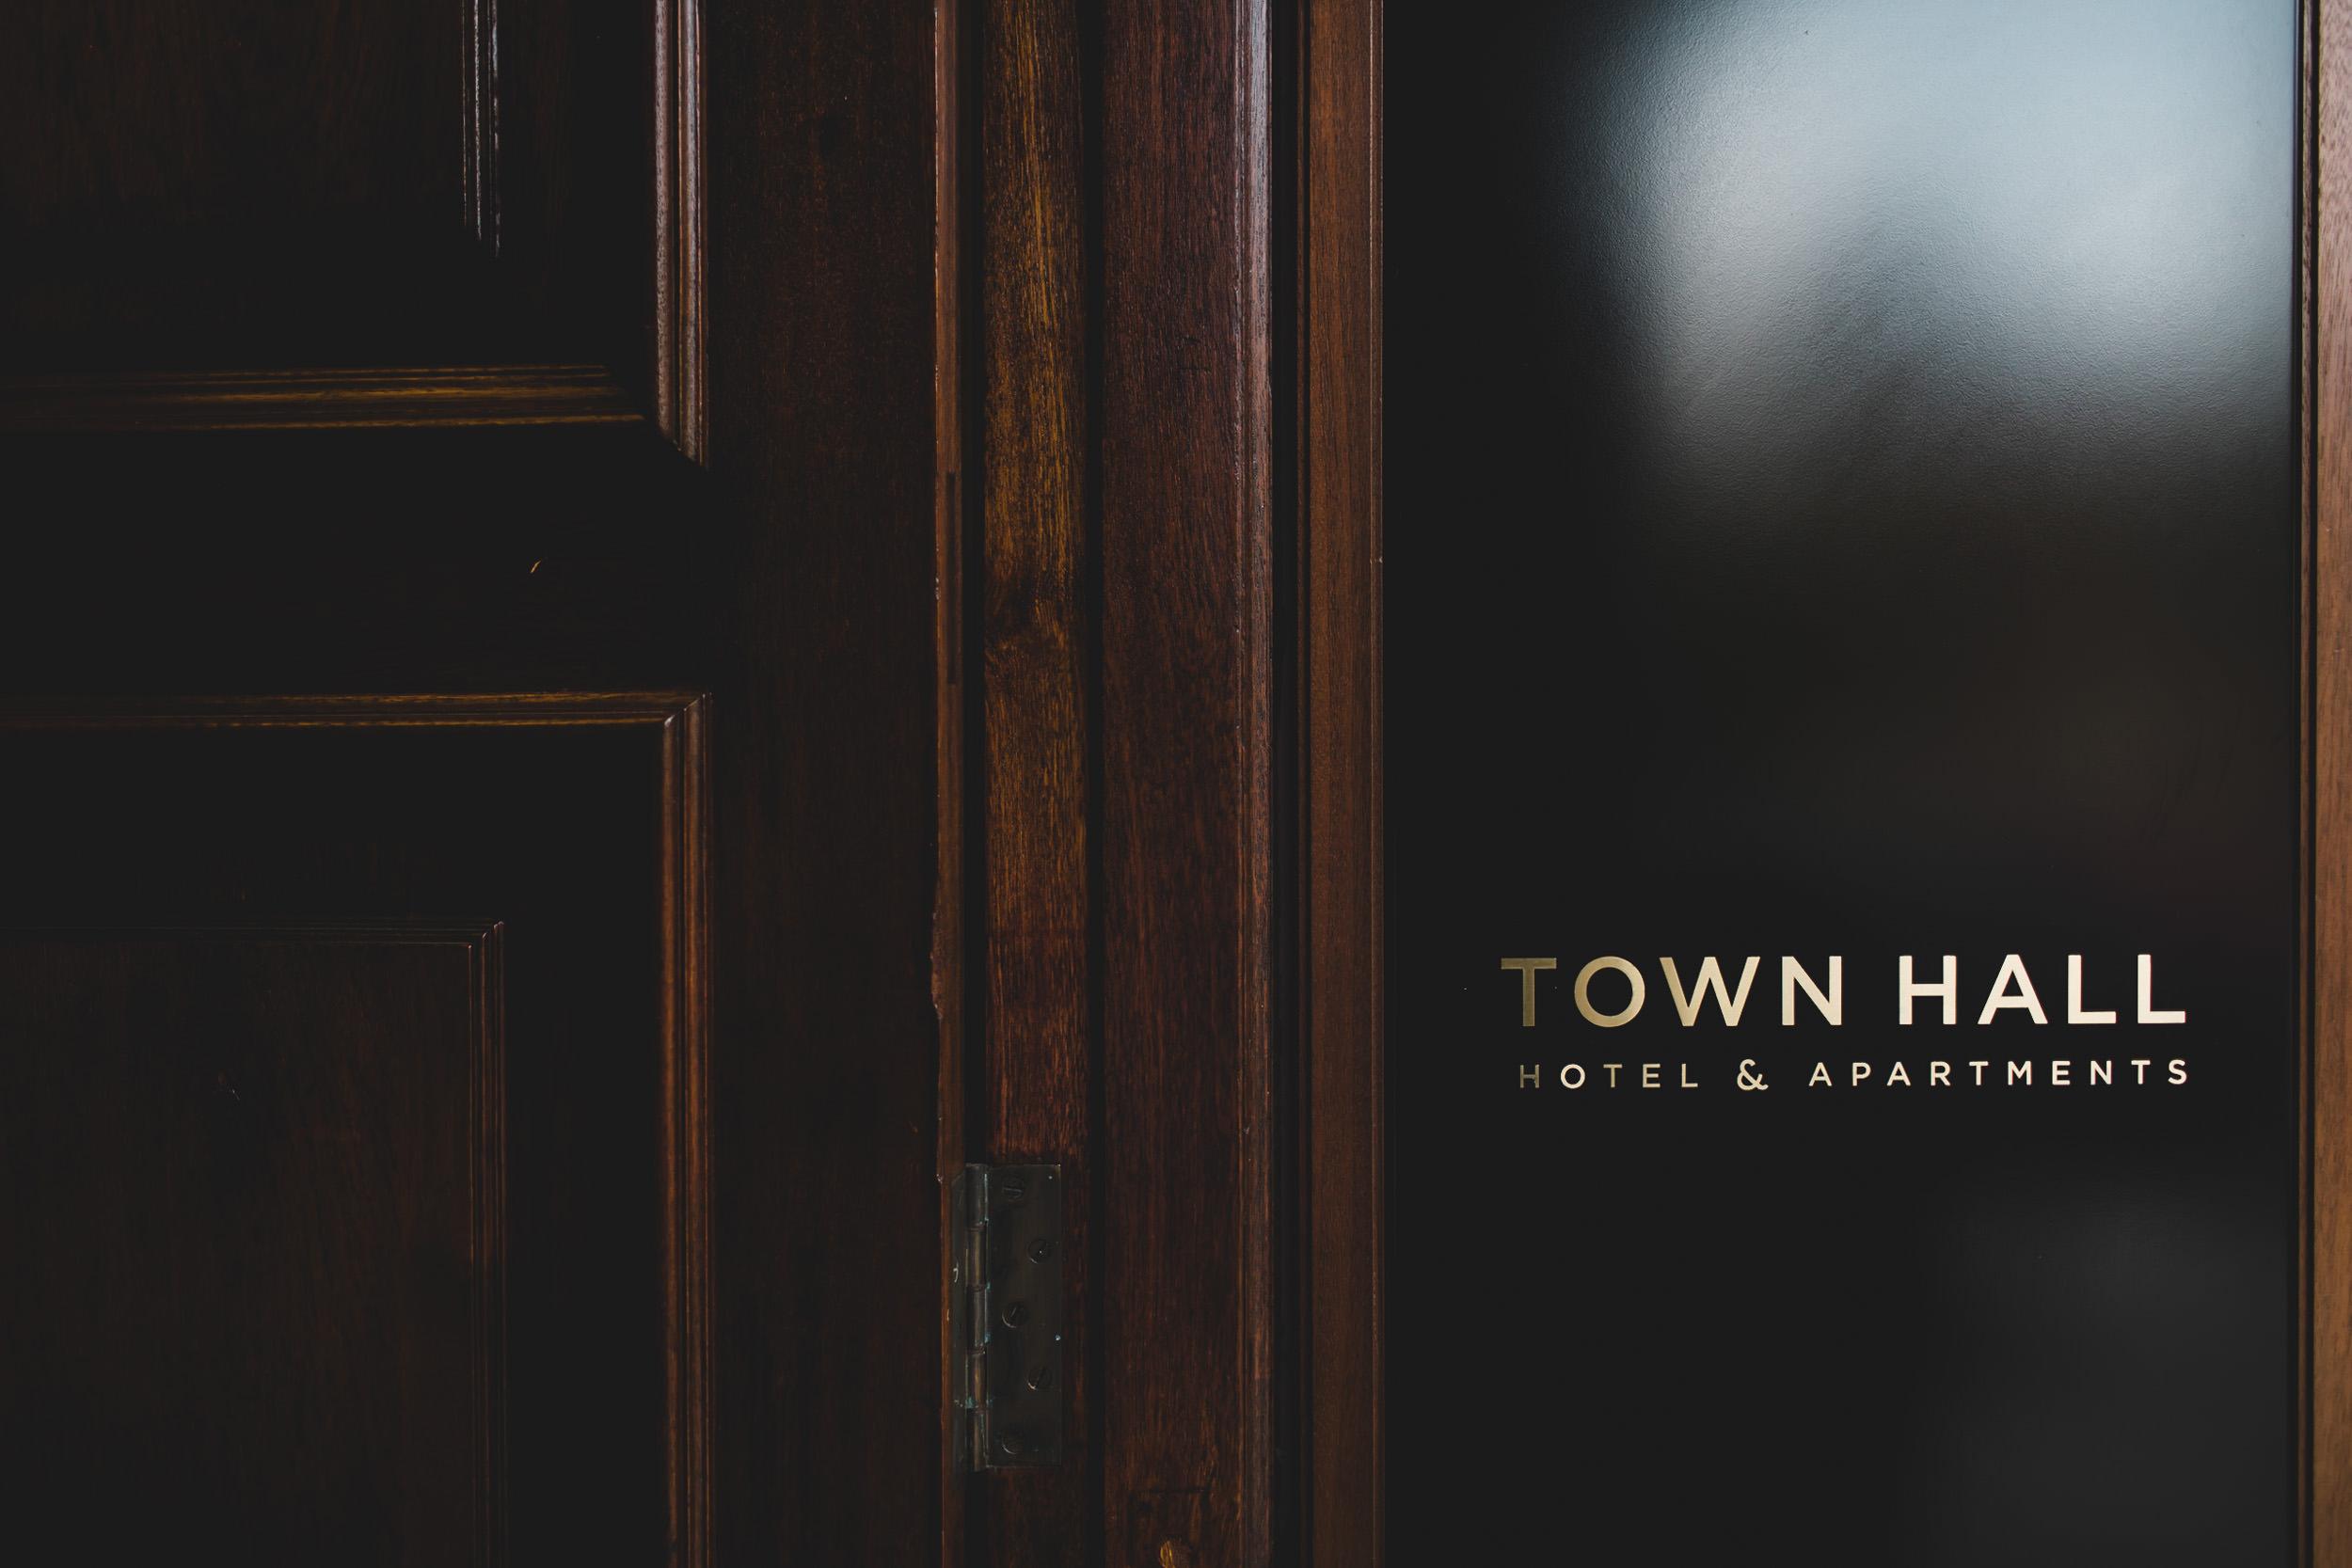 town hall hotel front door livery